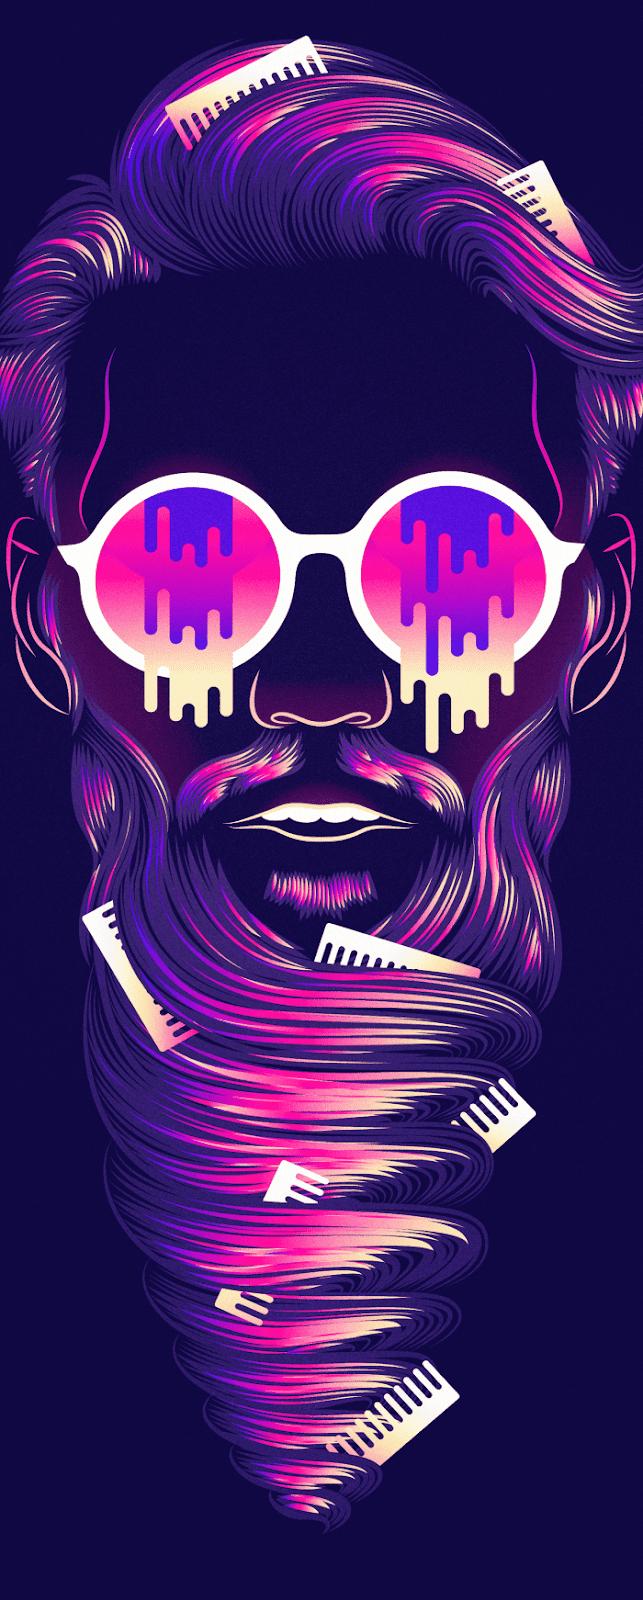 Patrick-Seymour-ilustraciones-adobe-illustrator